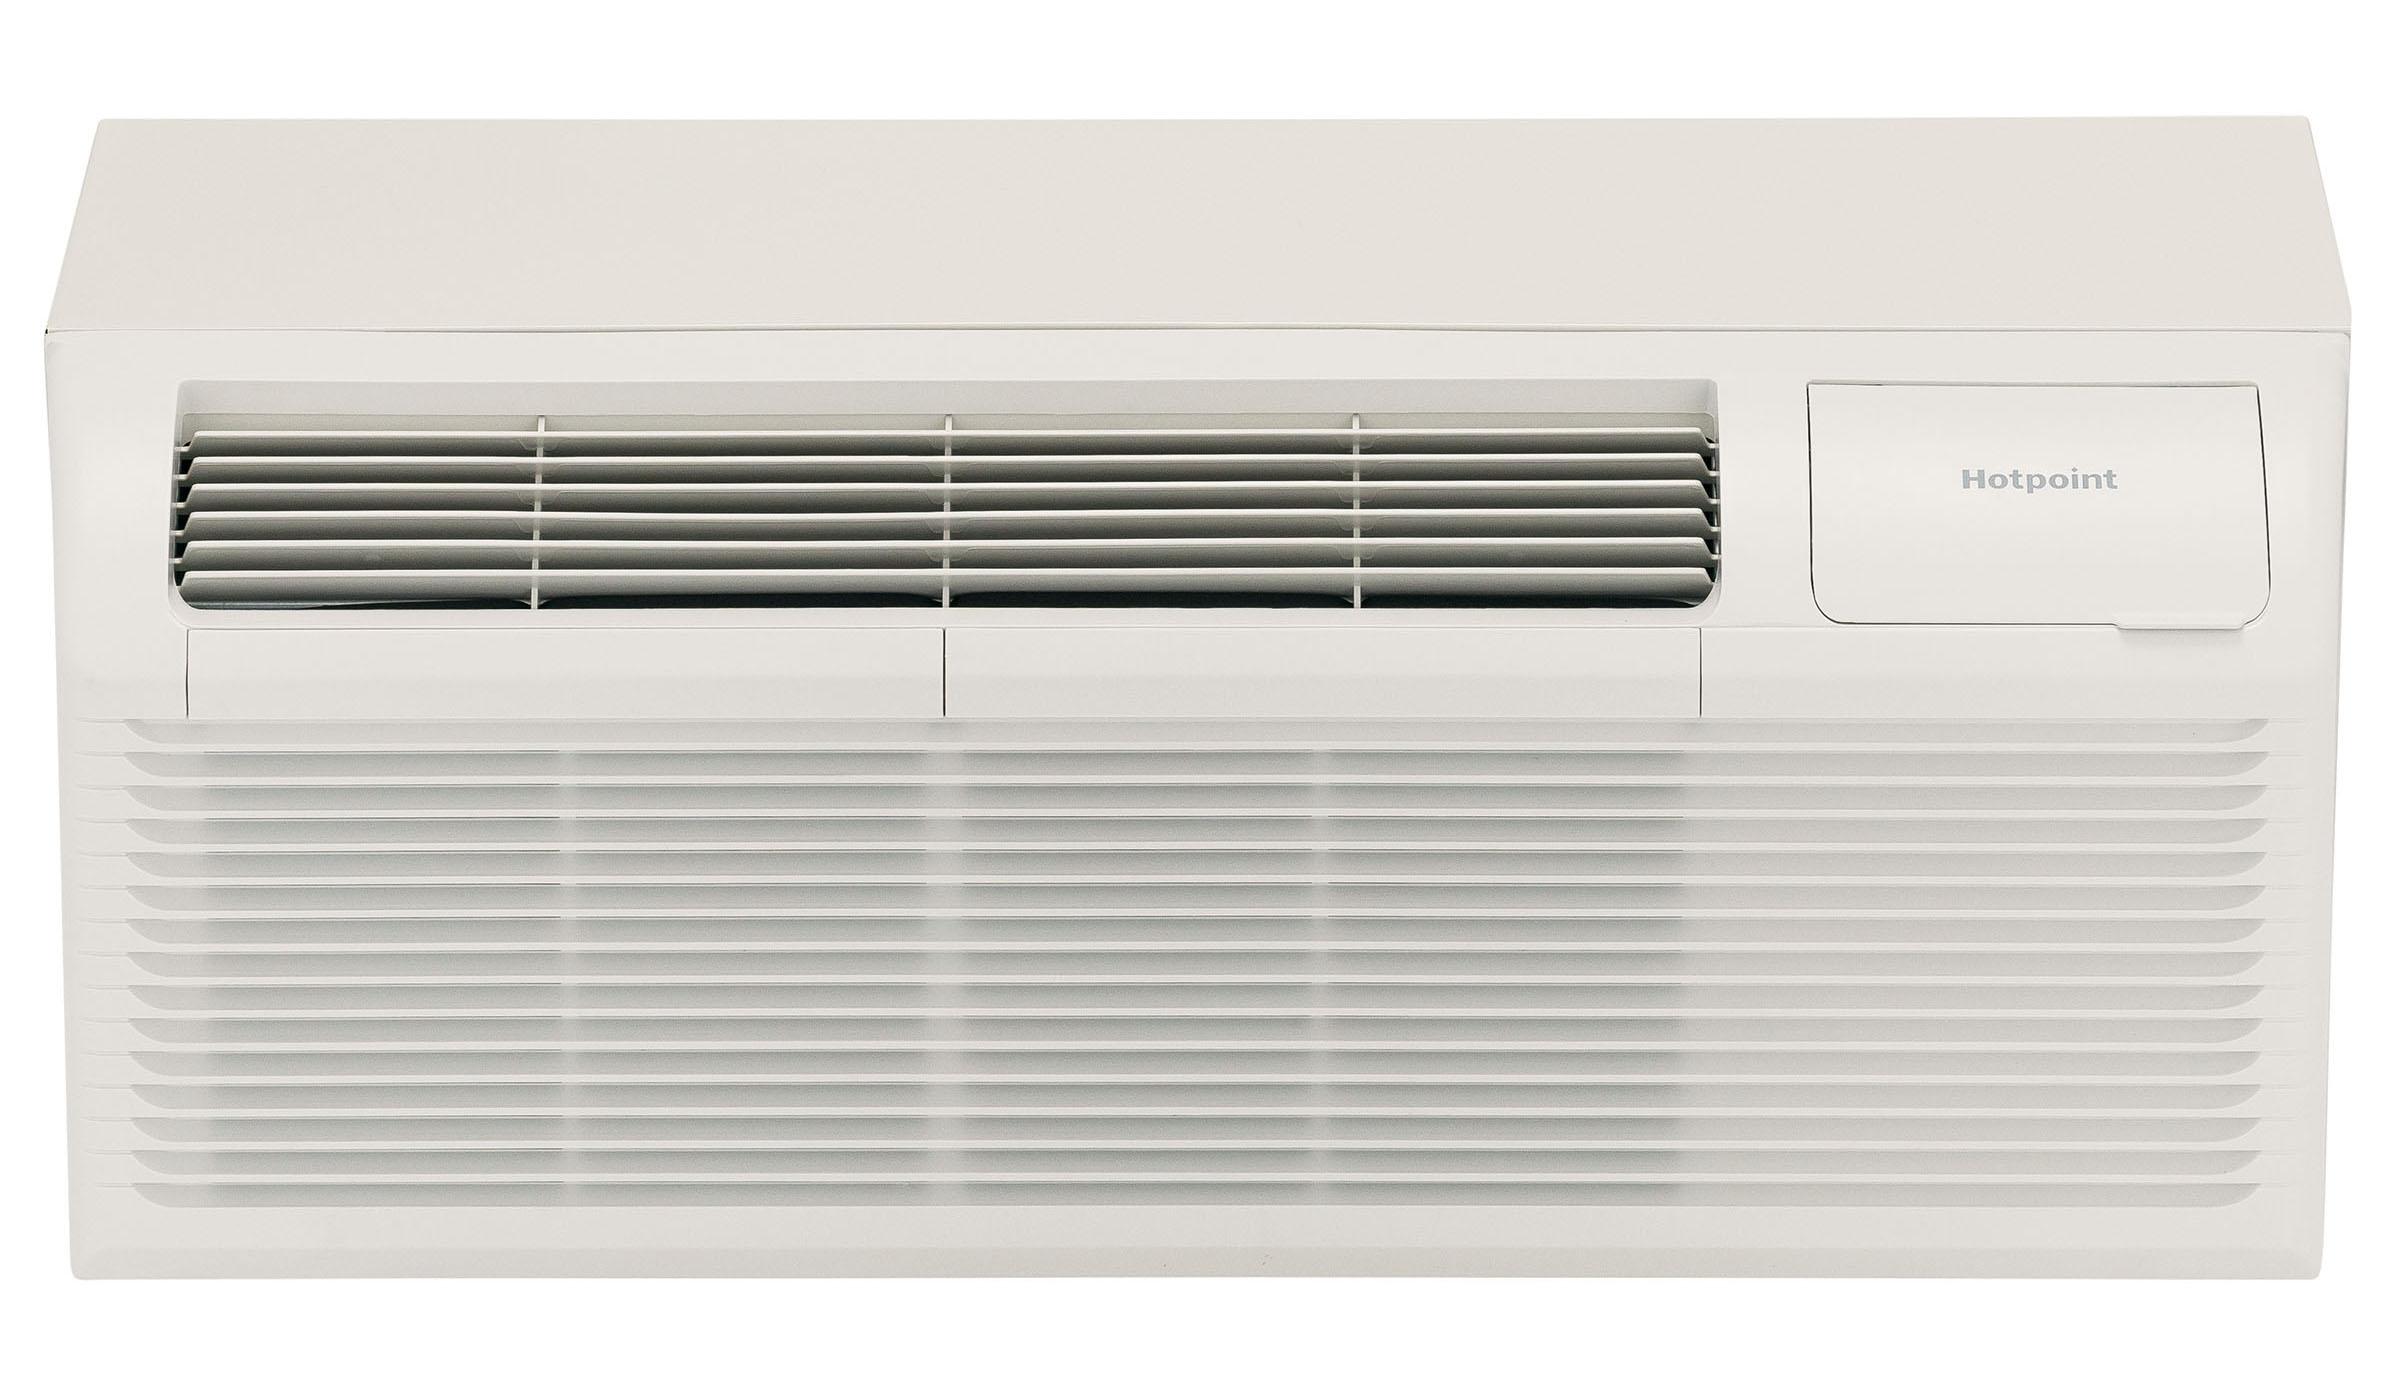 Hotpoint AH11H15D5B 15000 BTU PTAC Air Conditioner with Heat Pump - 30 Amp - 208/230 Volt